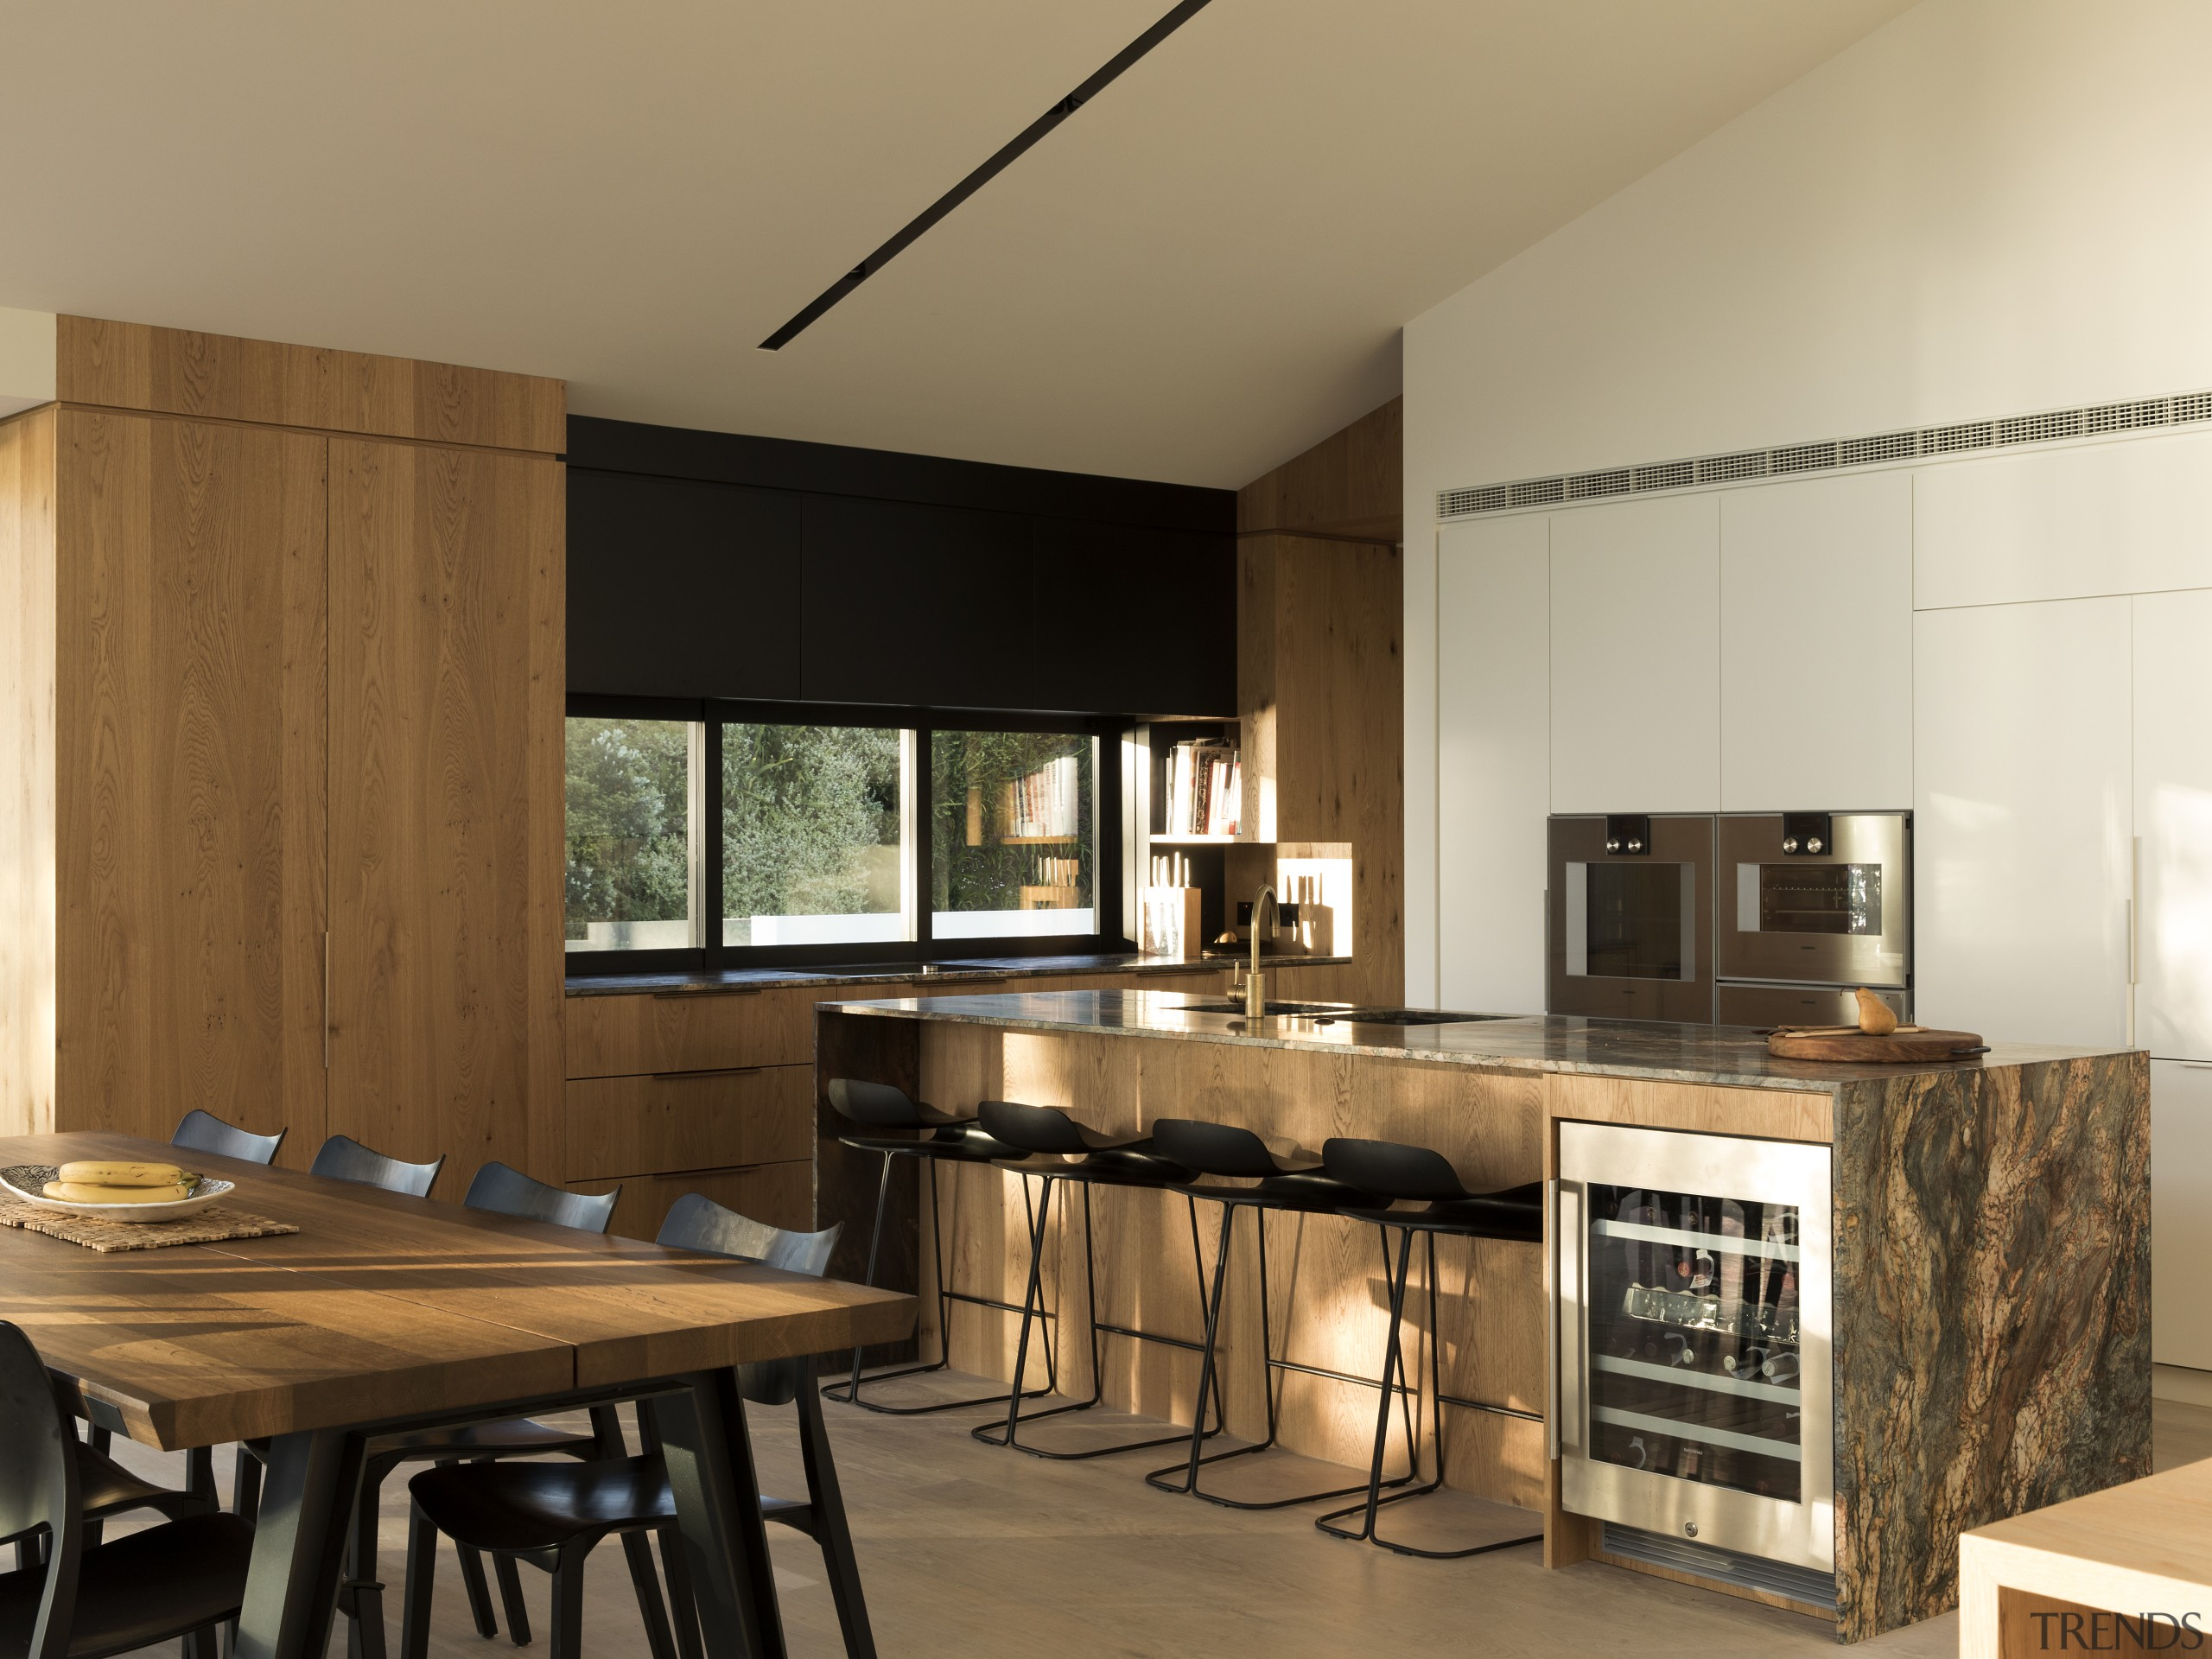 This slender marble benchtop overhangs the front of countertop, cuisine classique, interior design, kitchen, brown